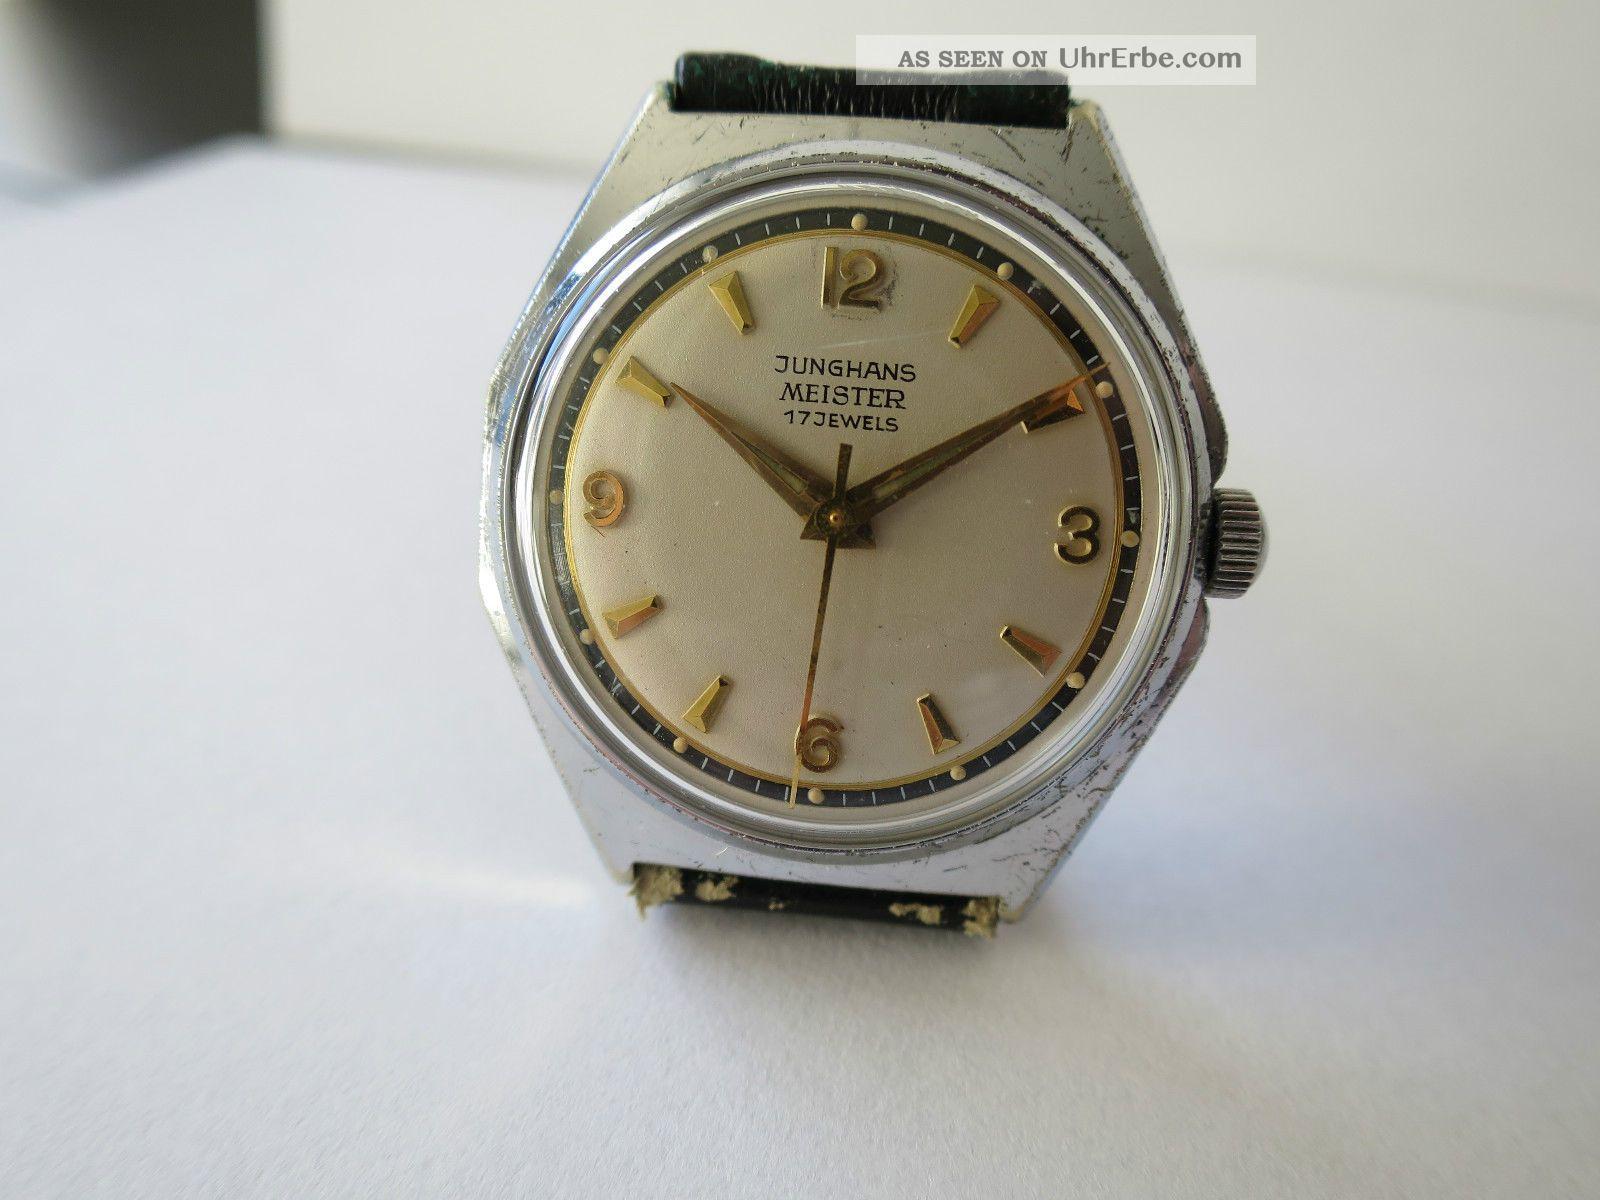 Junghans Meister Handaufzug Kaliber 82/1 Armbanduhren Bild